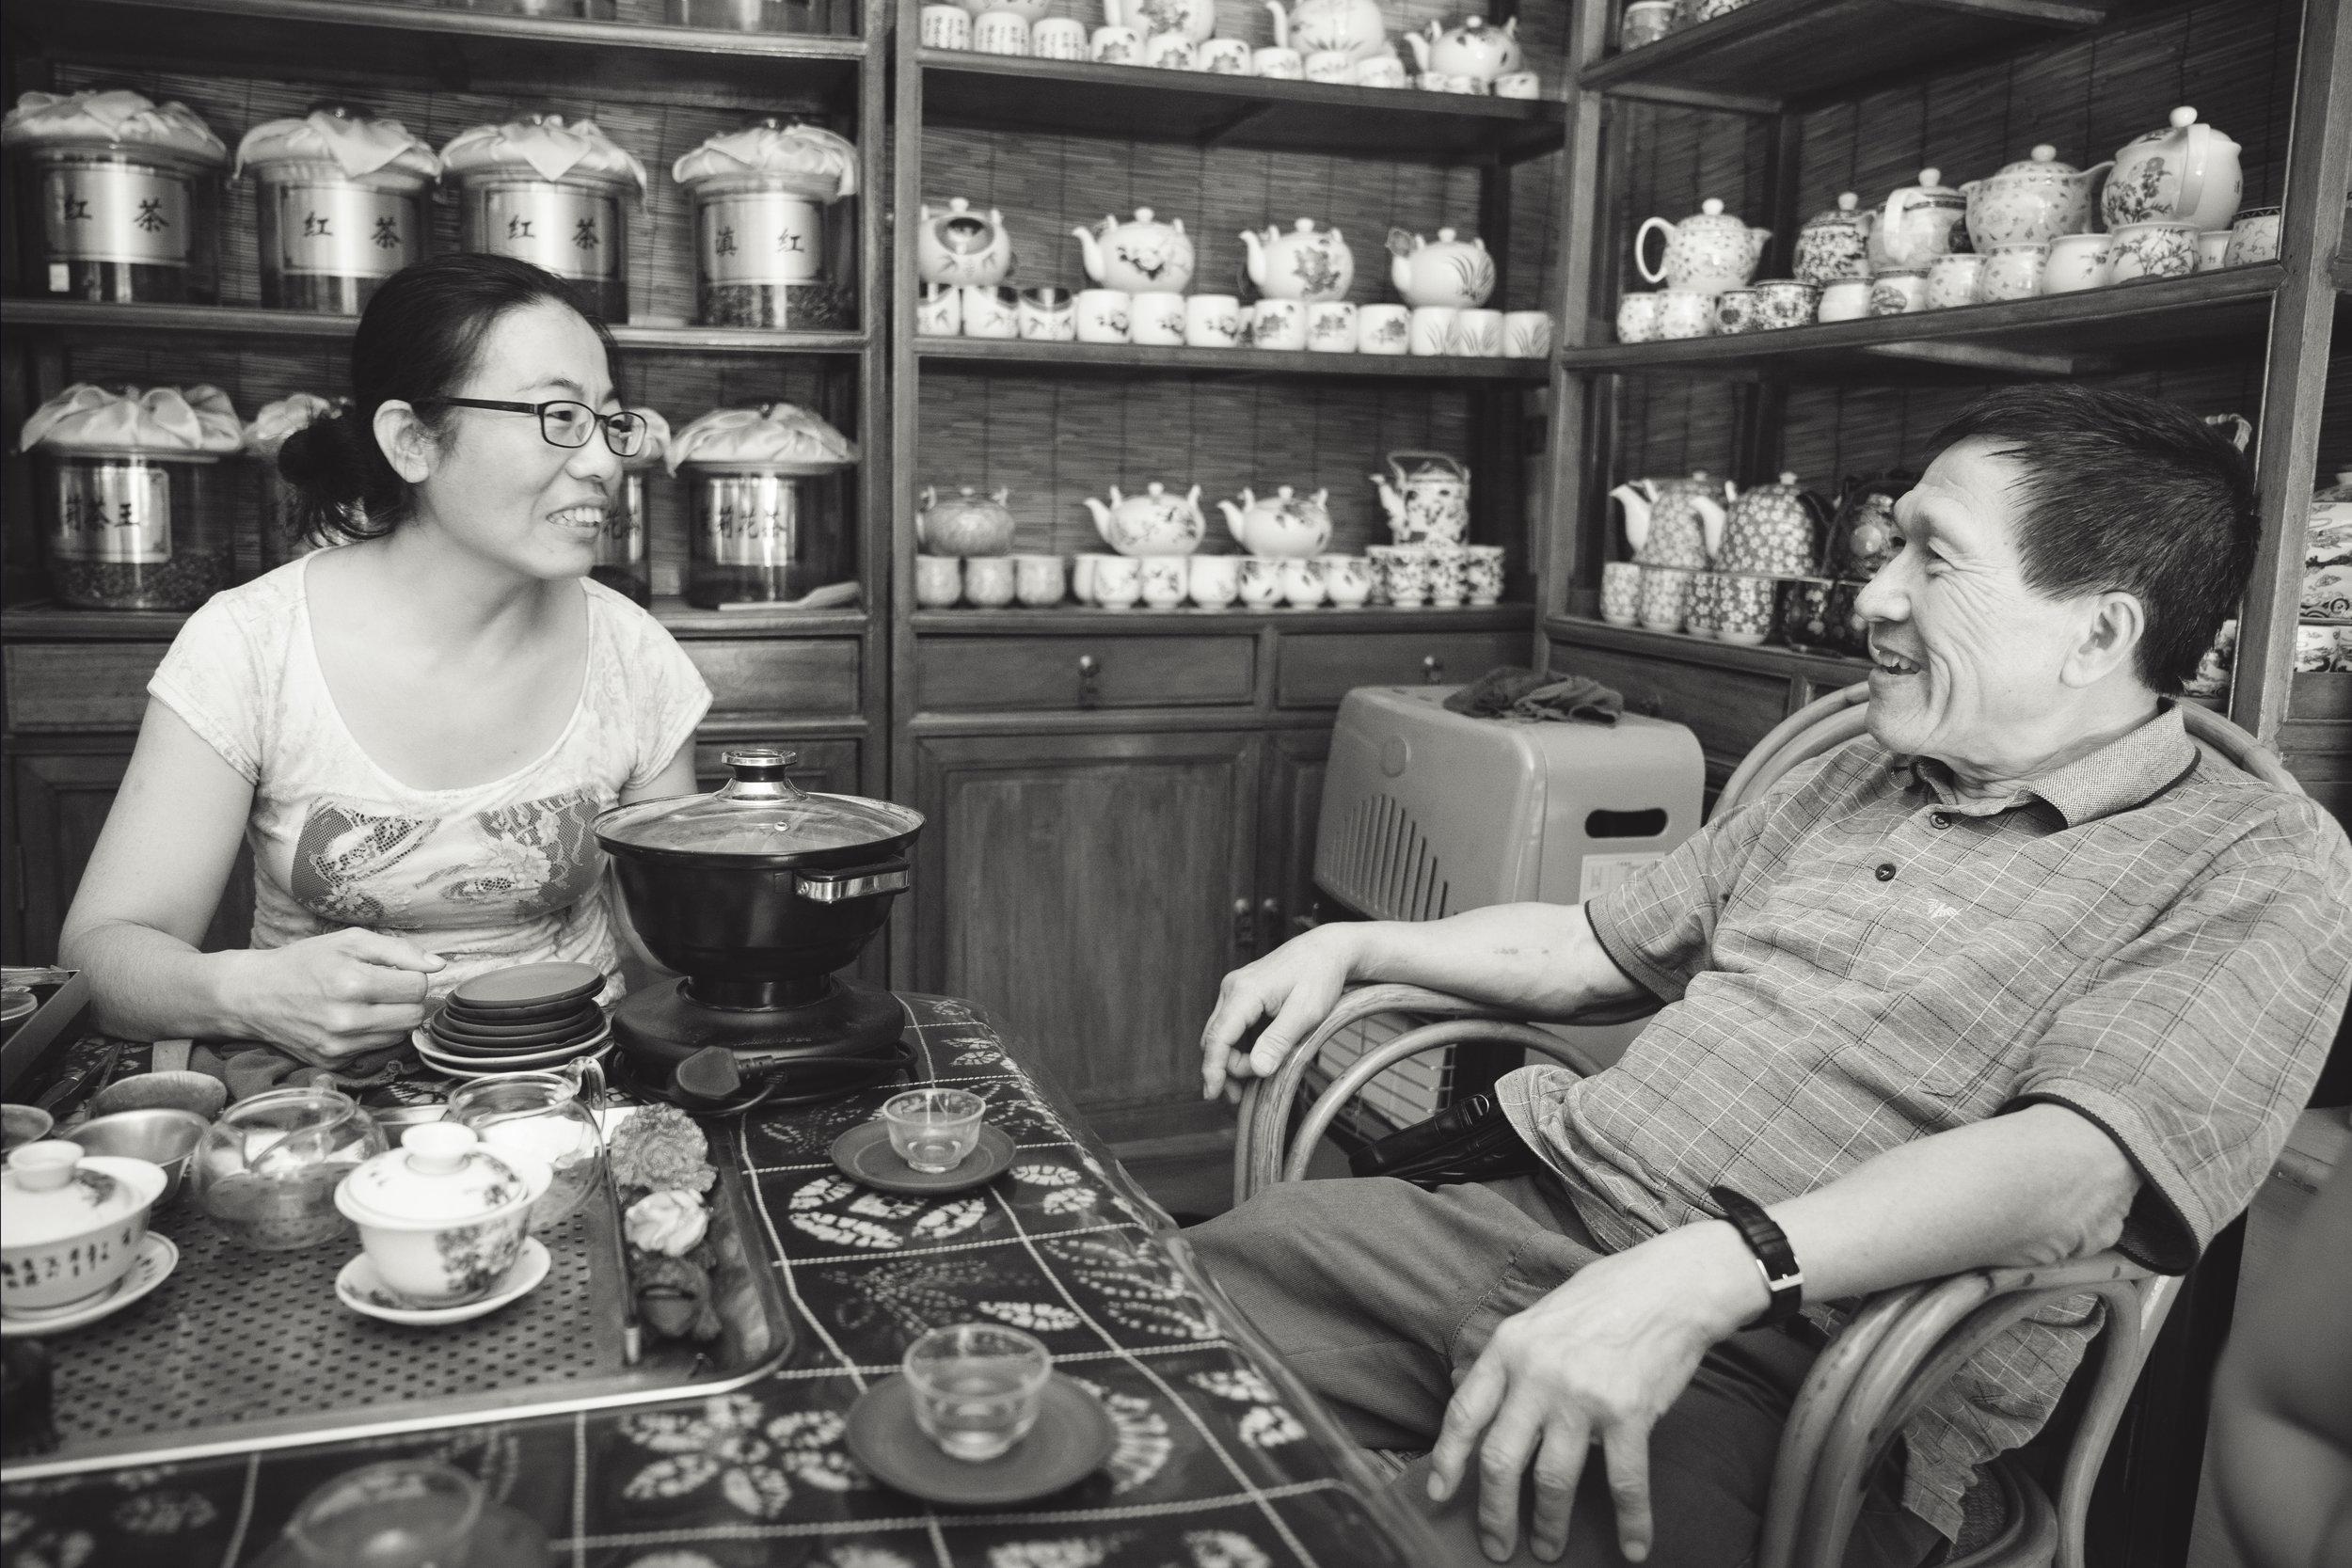 We shared tea